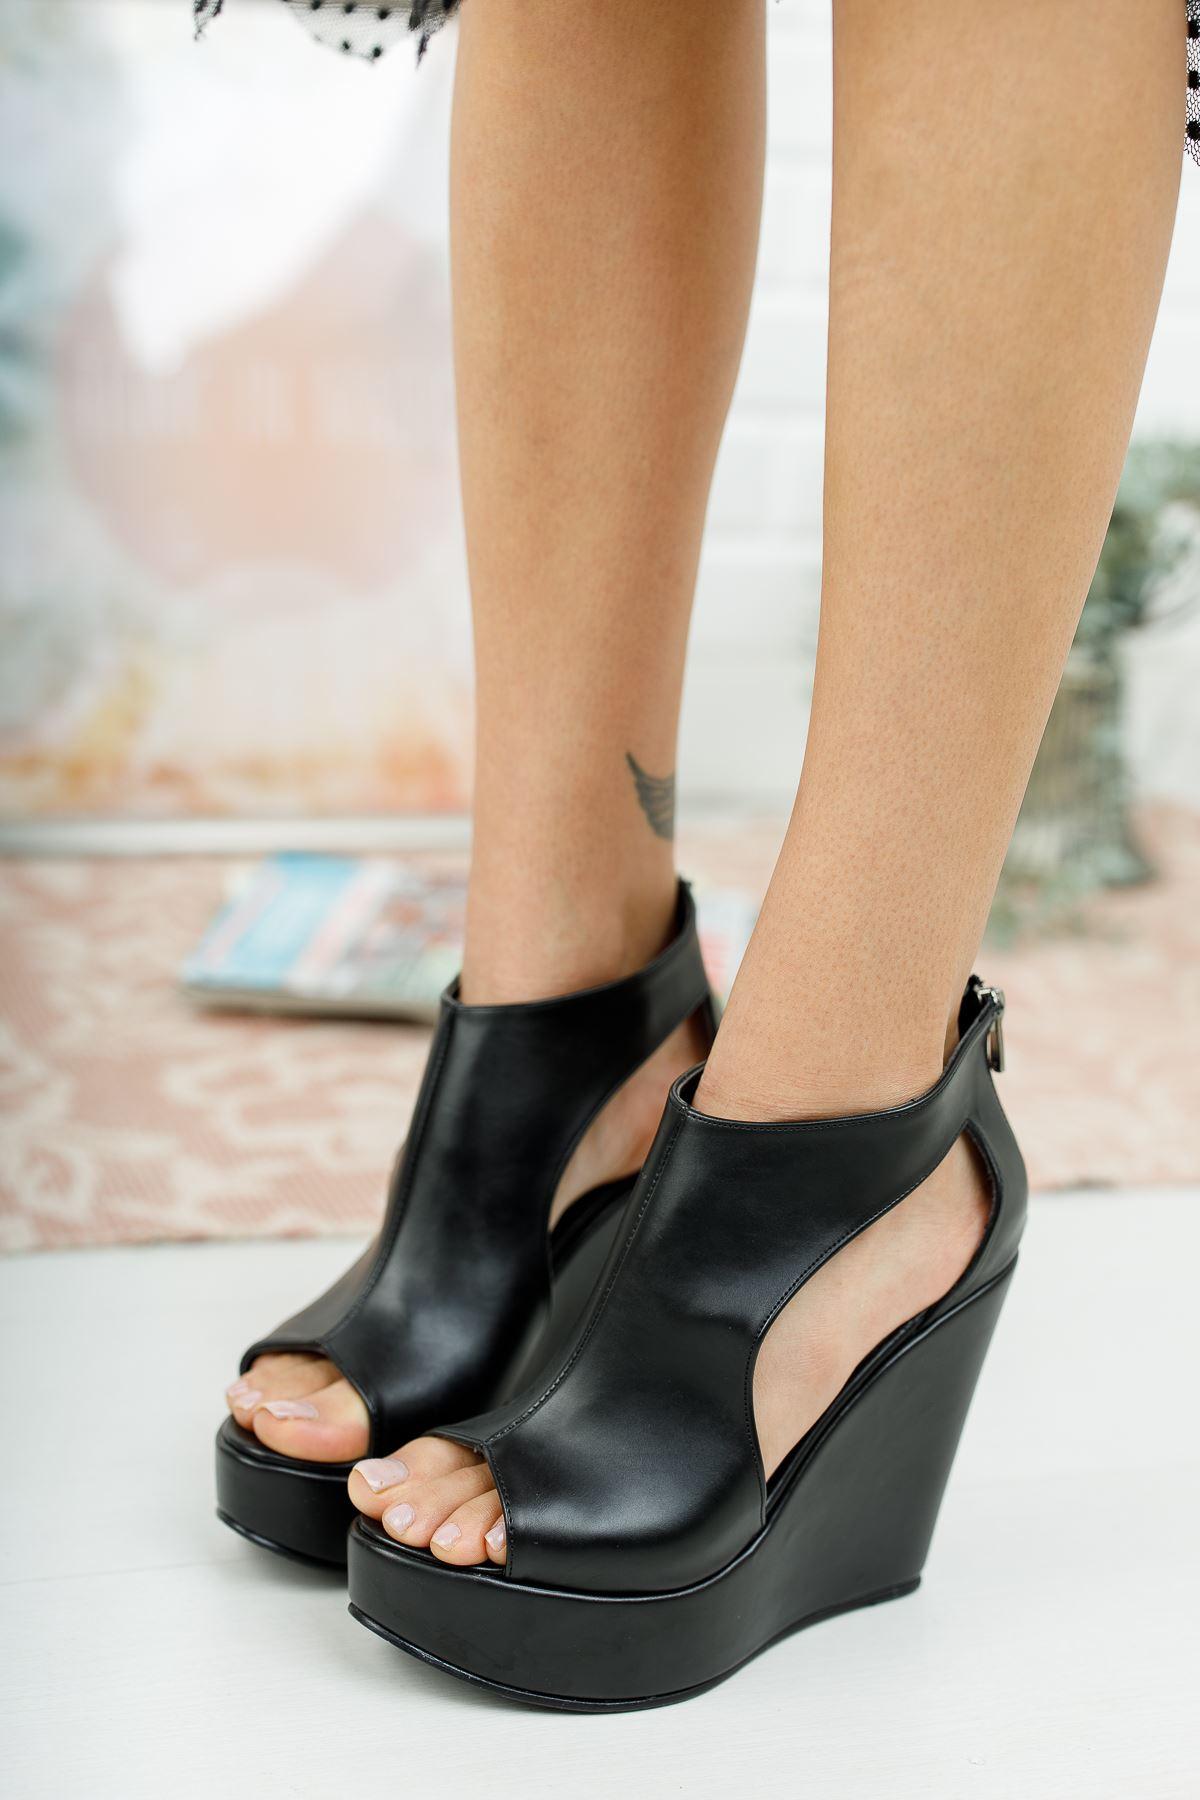 Maya Siyah Cilt Dolgu Topuklu Ayakkabı